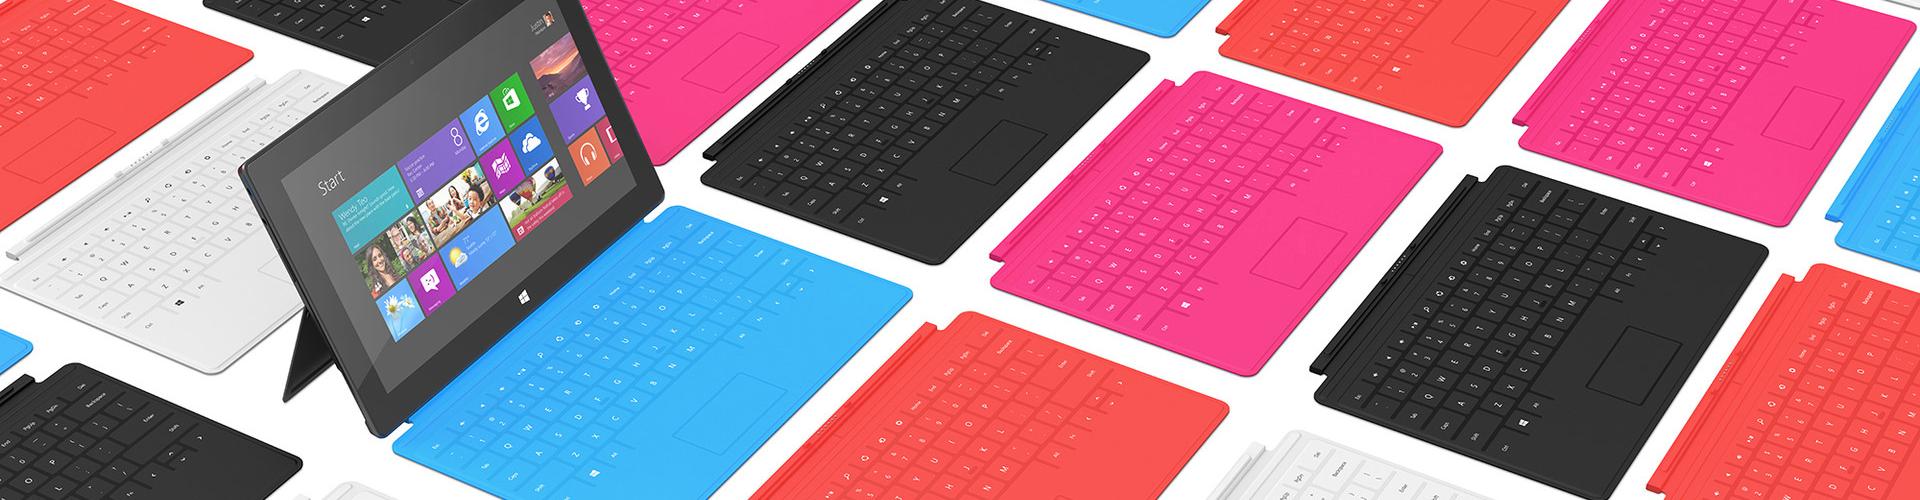 Microsoft Slashes Price of Surface RT